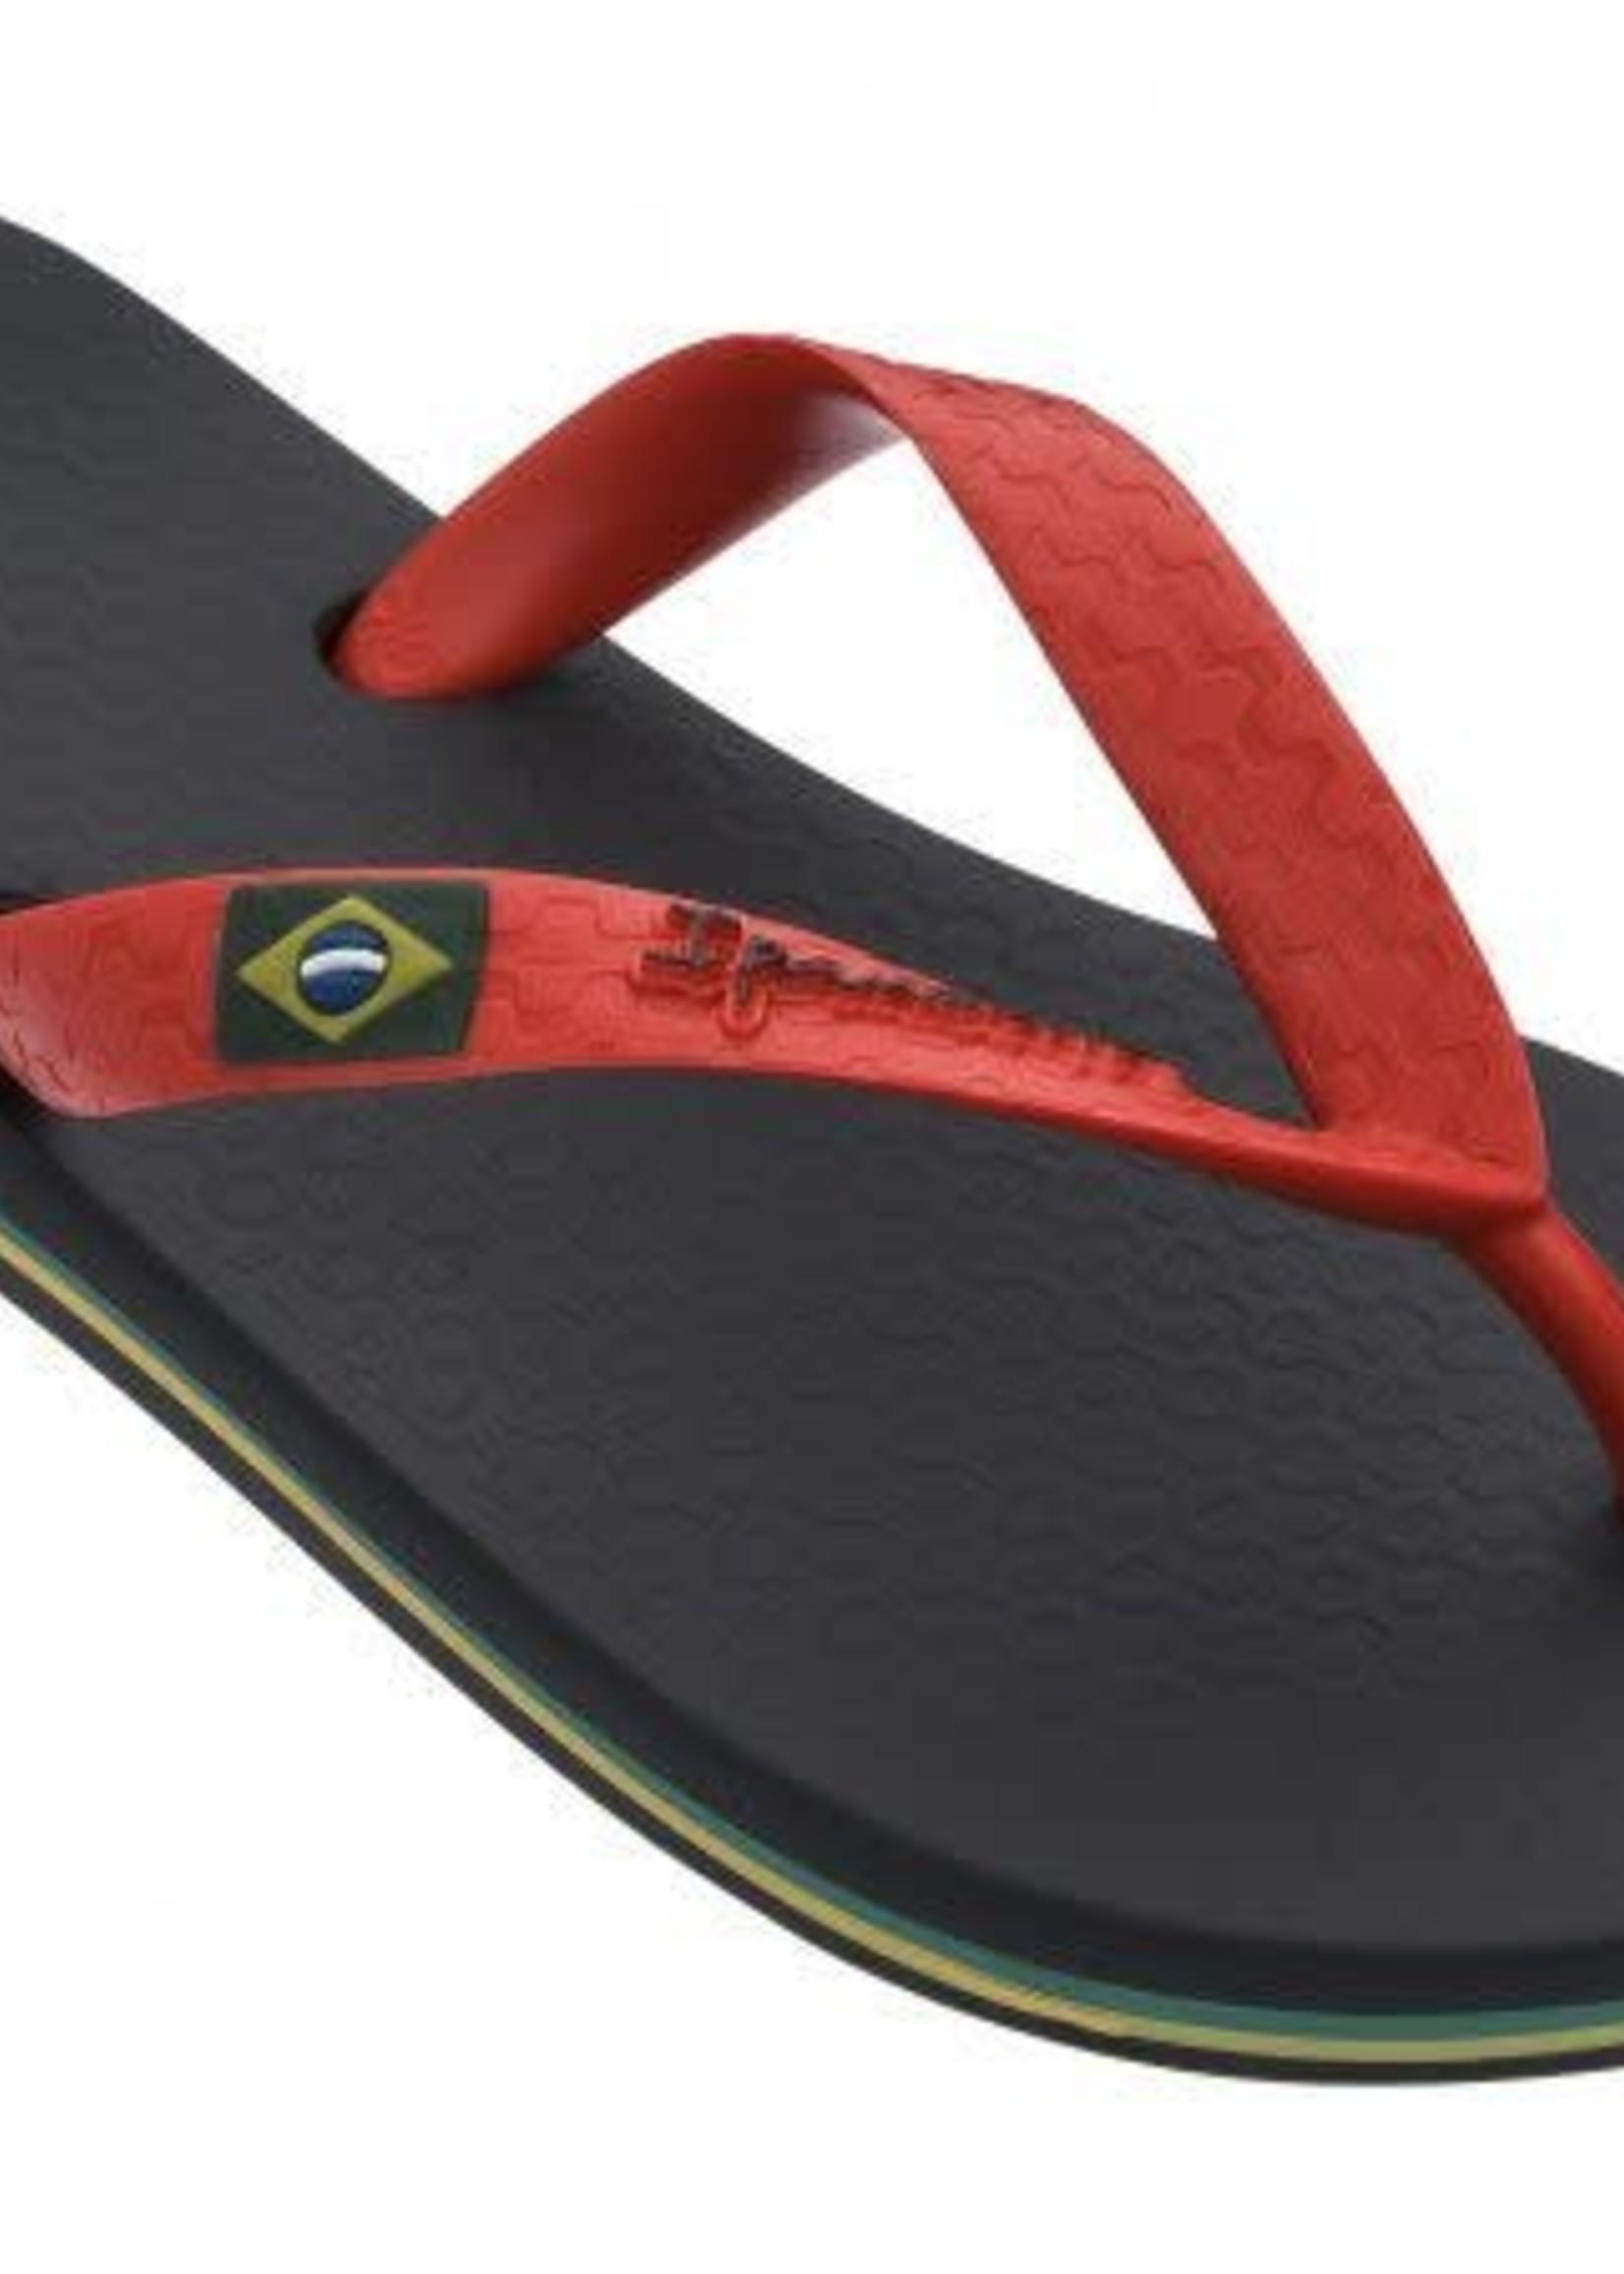 Ipanema Ipanema Slipper Kids - Clas Brazil - Zwart/Rood - Vegan